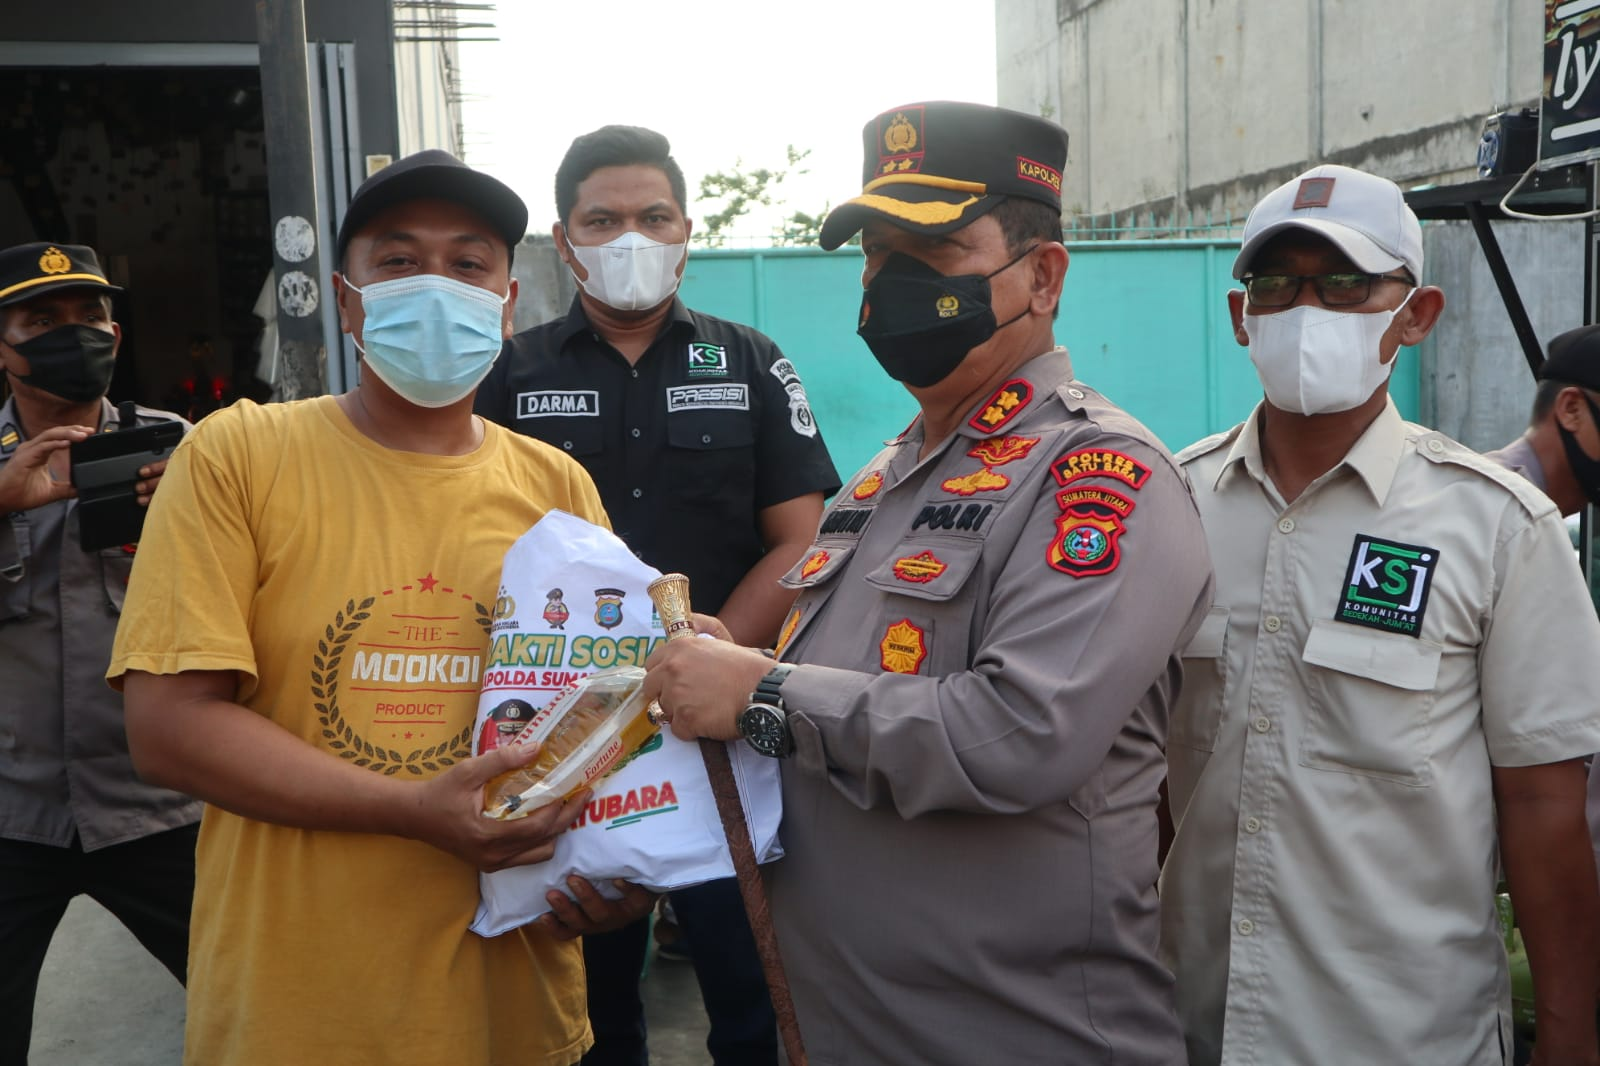 Jelang Idul Adha Polres Batu Bara Beri Bantuan Kepada Pedagang Gerobak Terdampak Covid 19